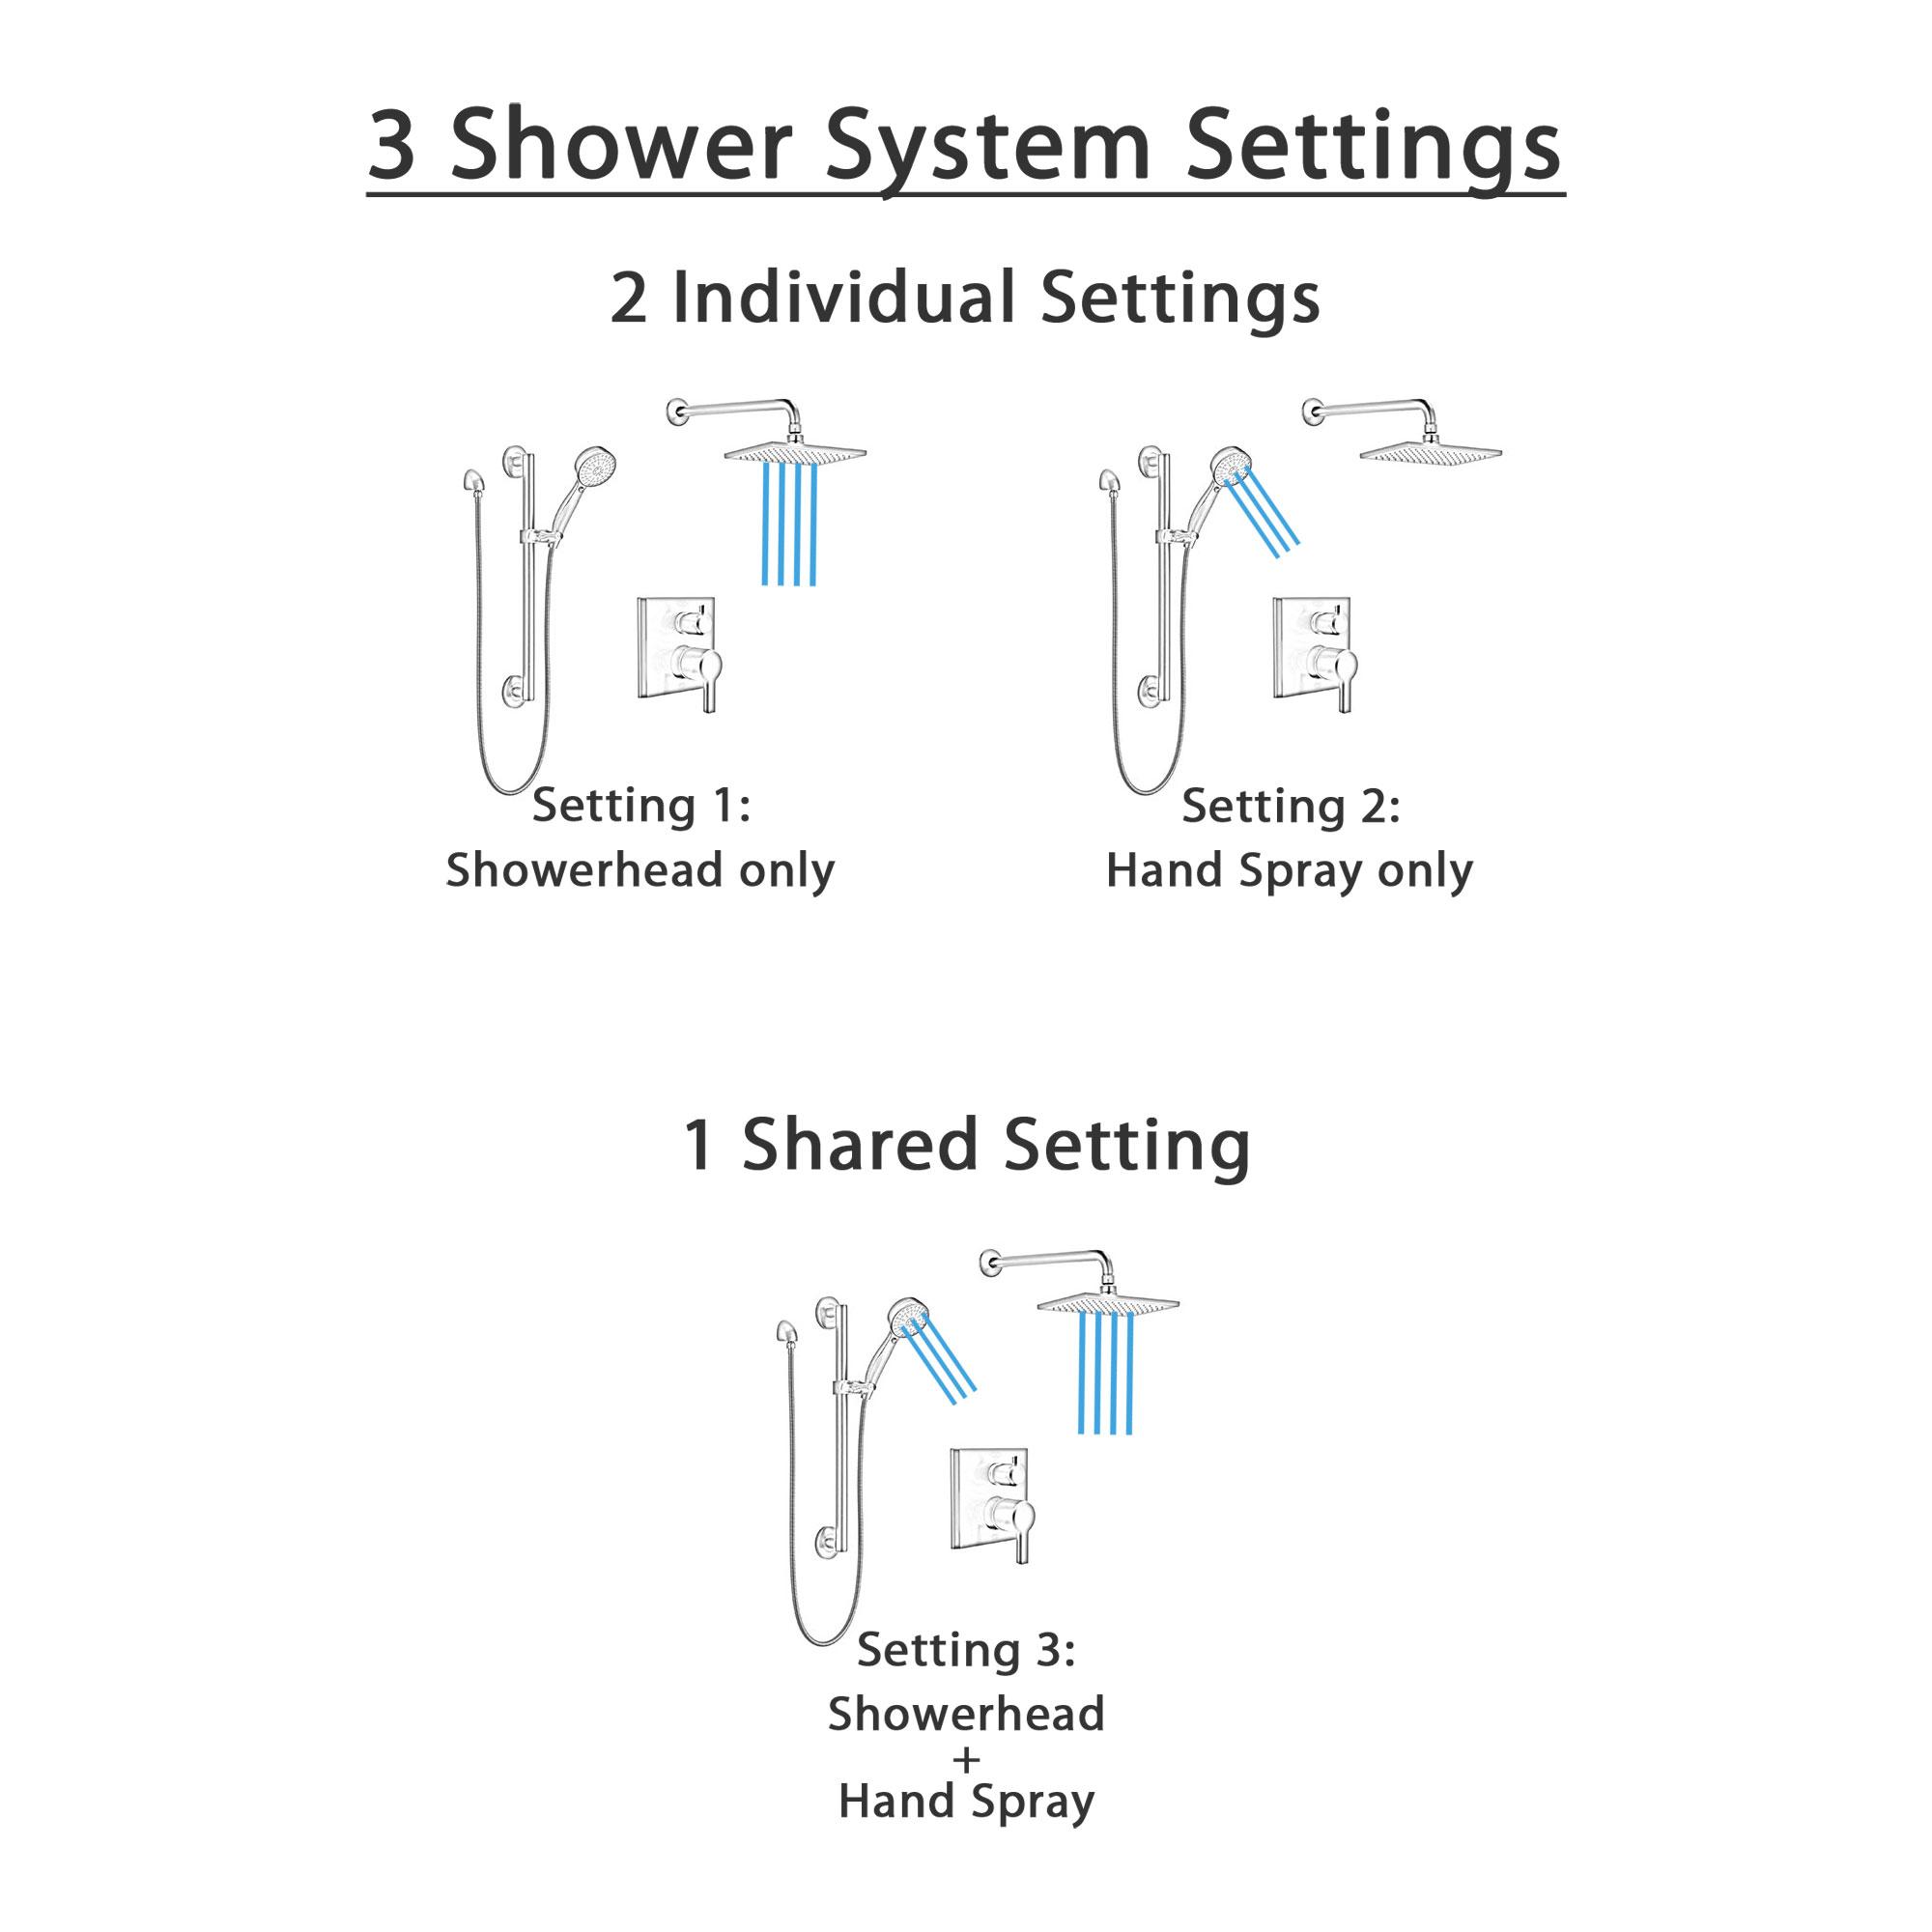 Delta Pivotal Matte Black Finish Shower System with Integrated Diverter, Modern Wall Mount Rain Showerhead, and Grab Bar Slide Hand Sprayer SS24899BL3